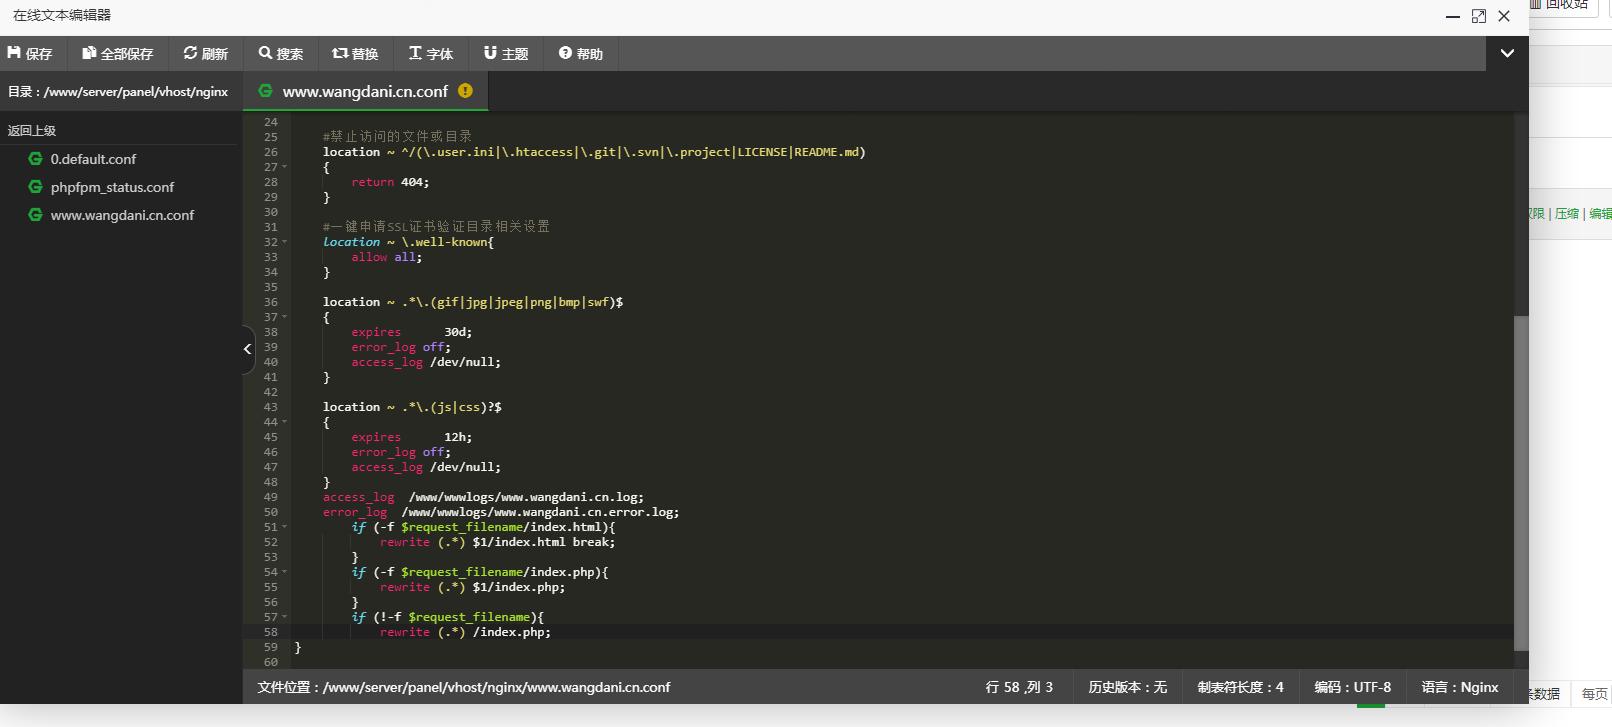 宝塔面板Linux下zblog伪静态方法